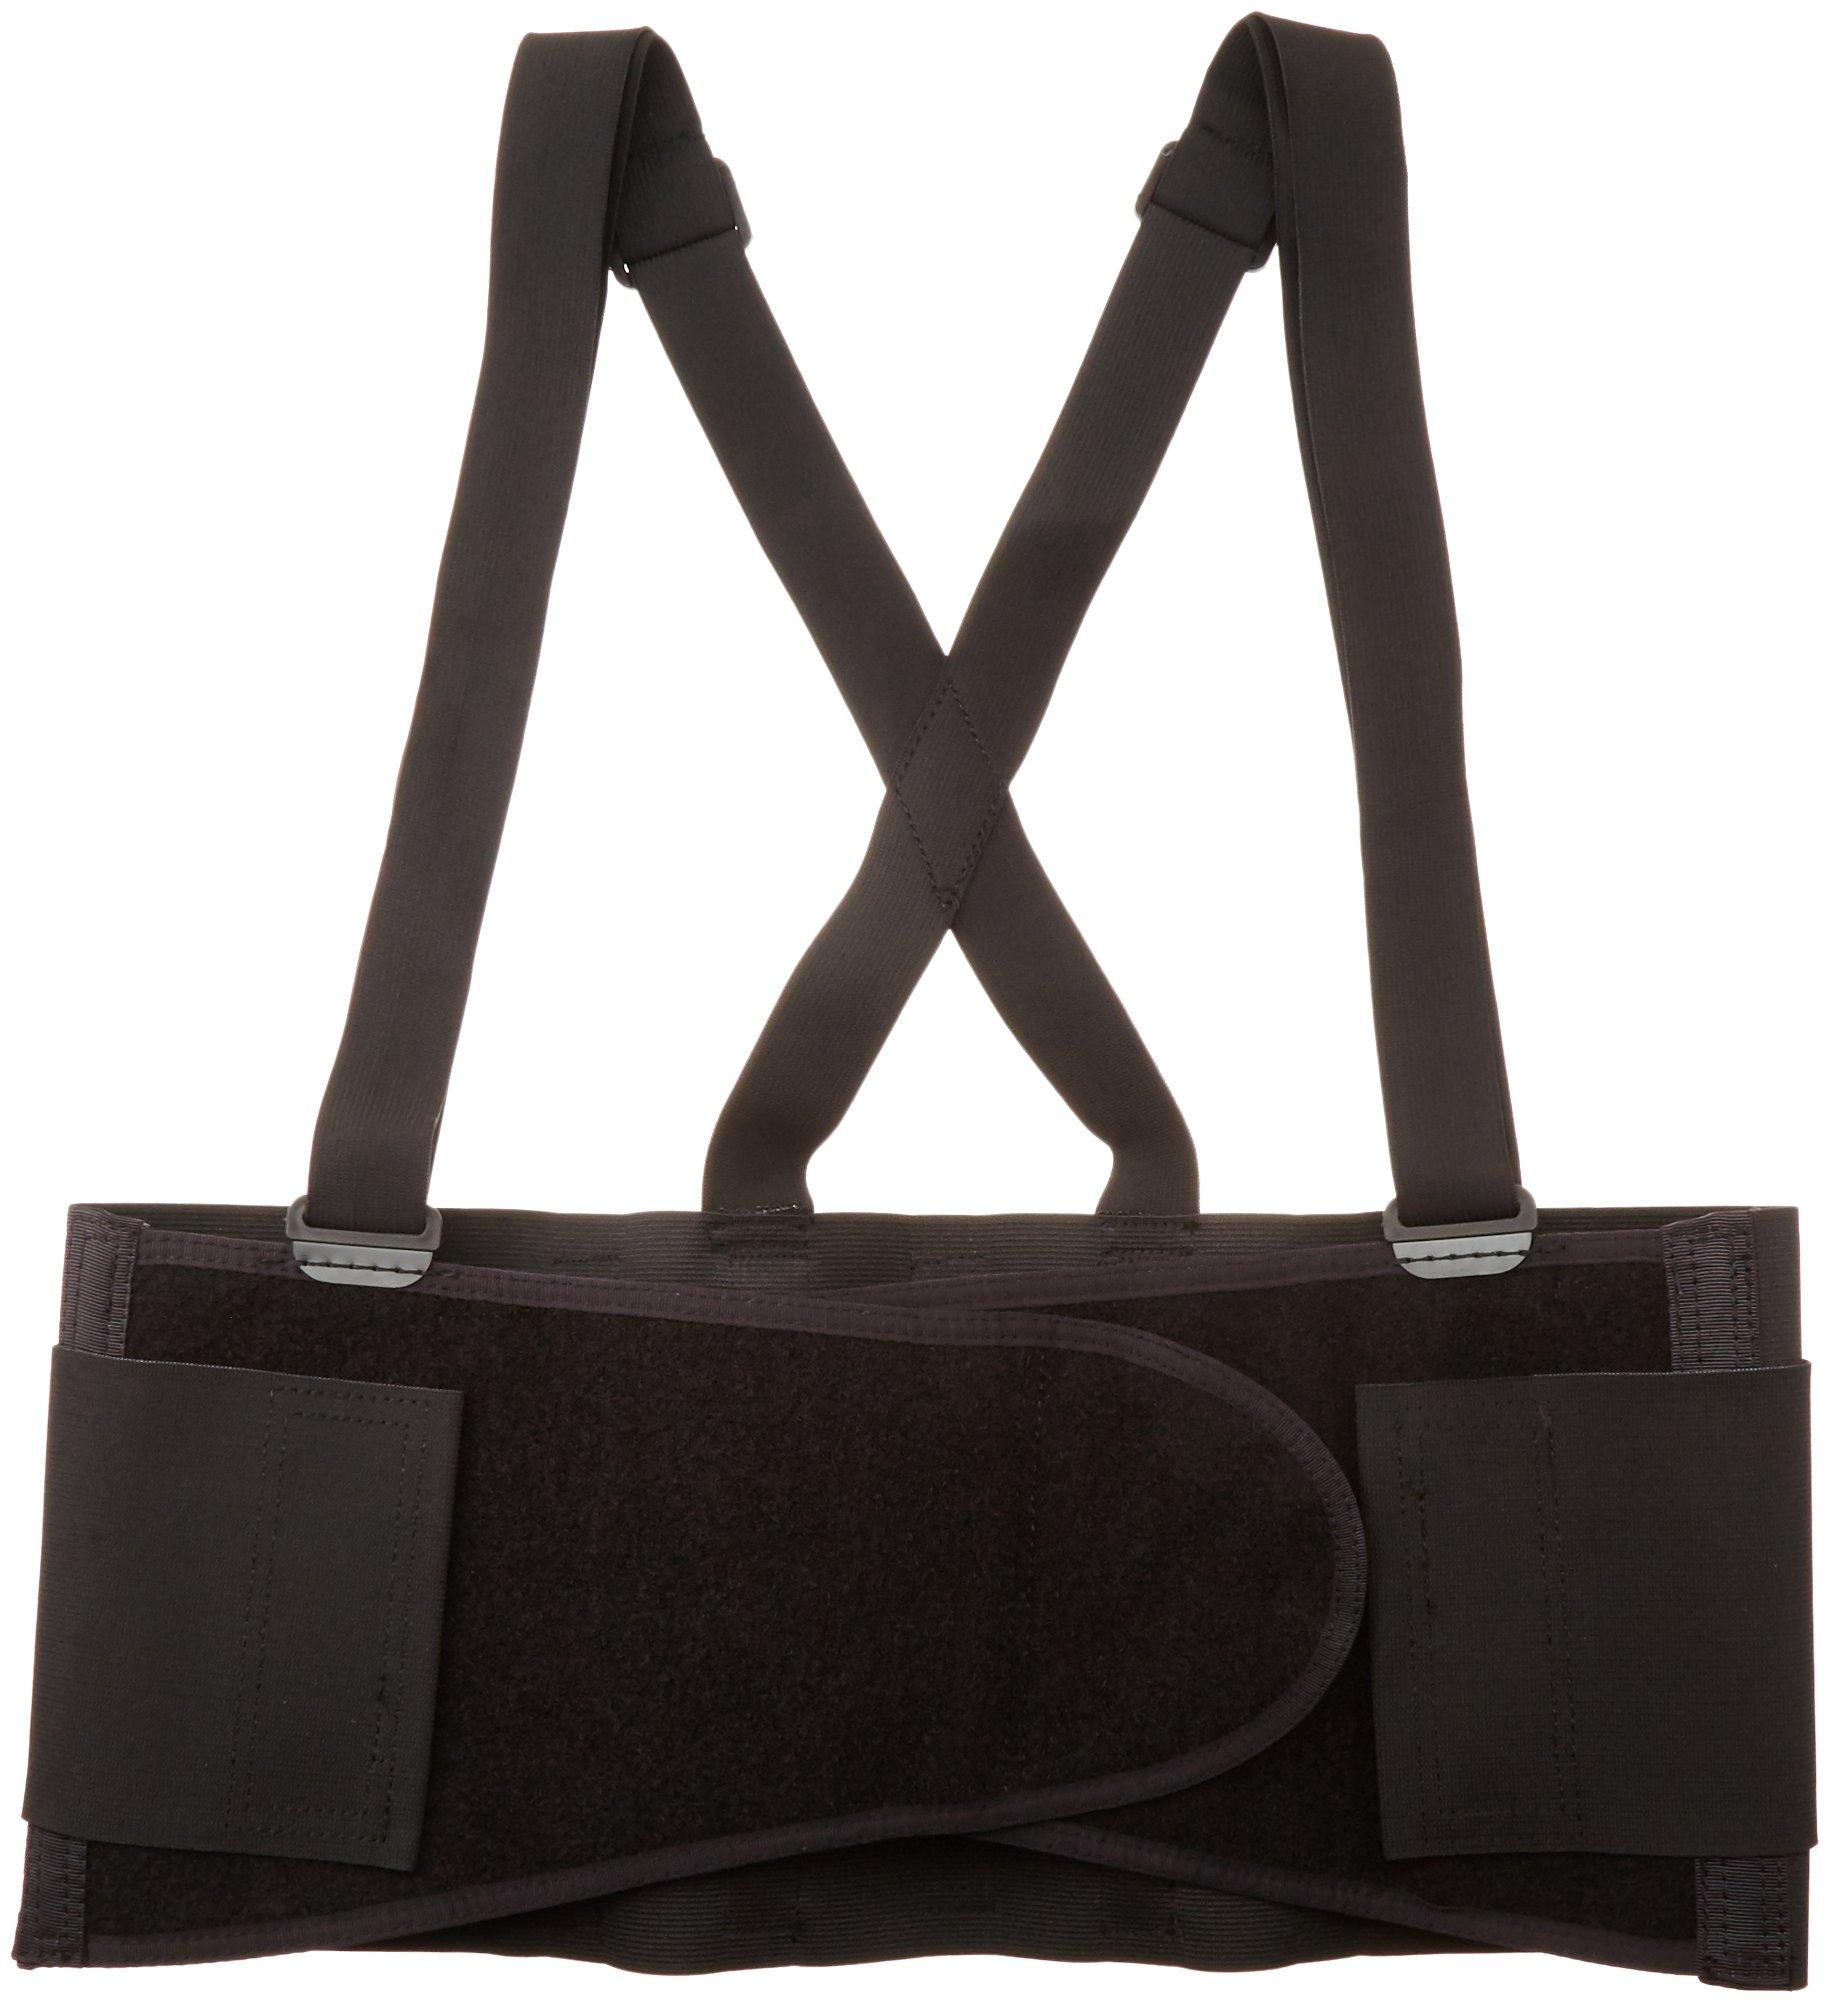 CLC Custom Leathercraft 5000X Elastic Back Support Belt Fits Waists, 46-Inch to 56-Inch, X-Large